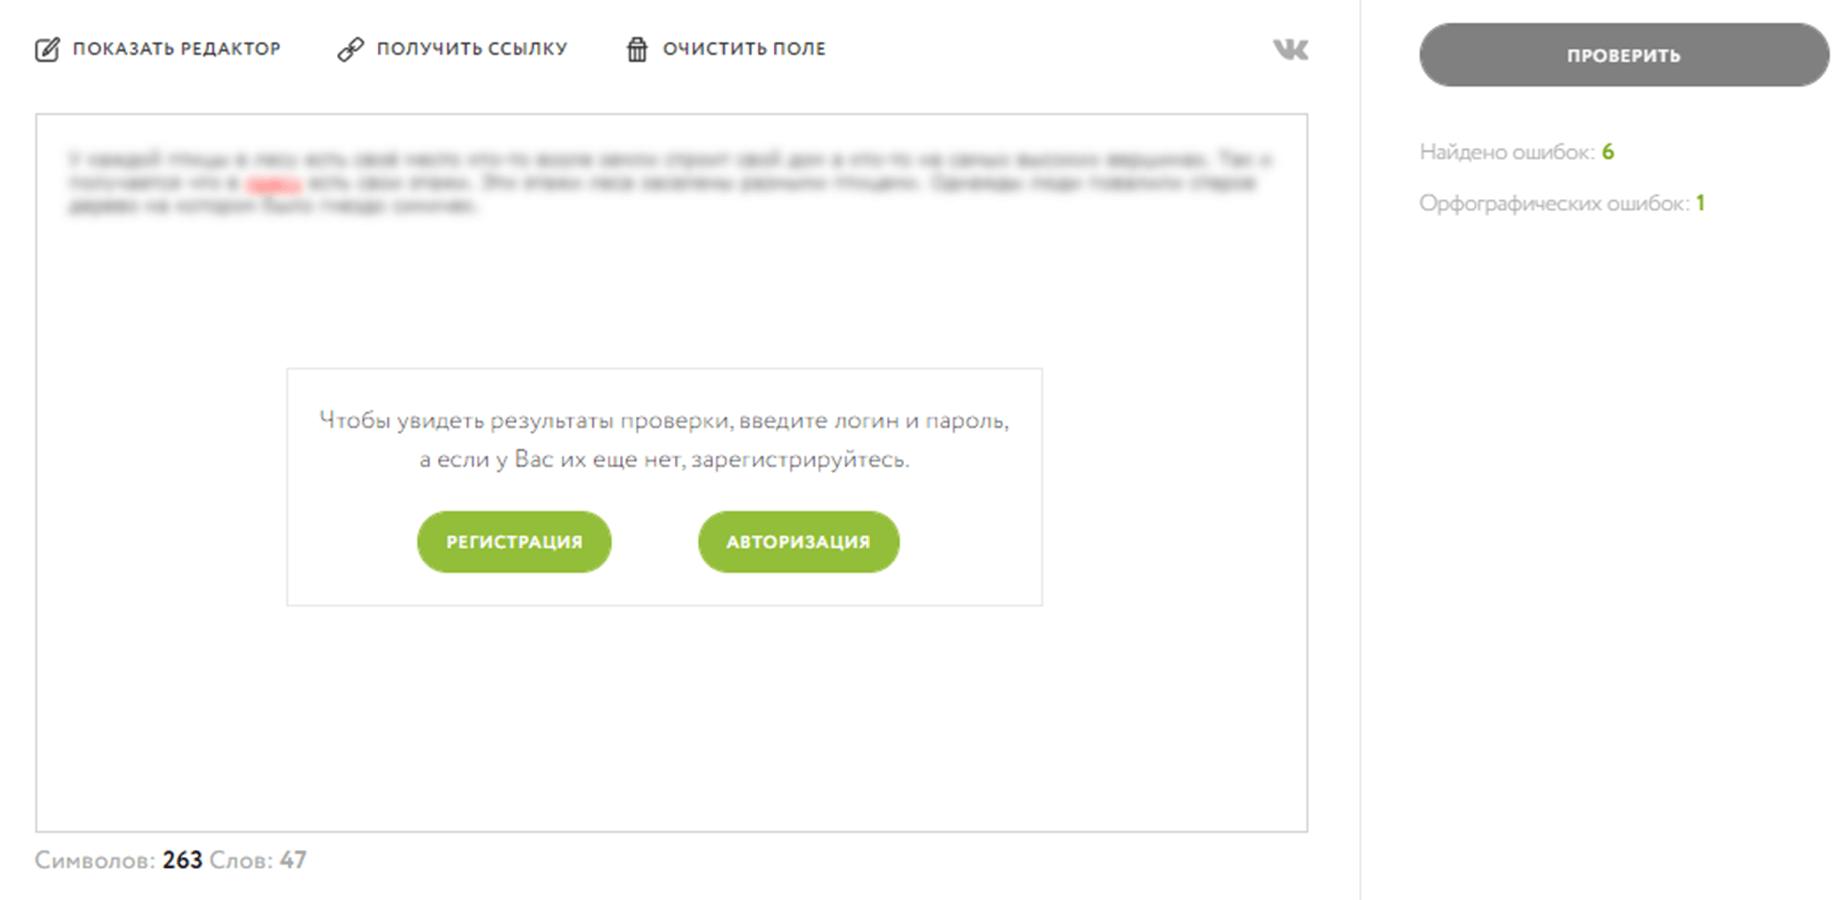 Проходим процедуру регистрации